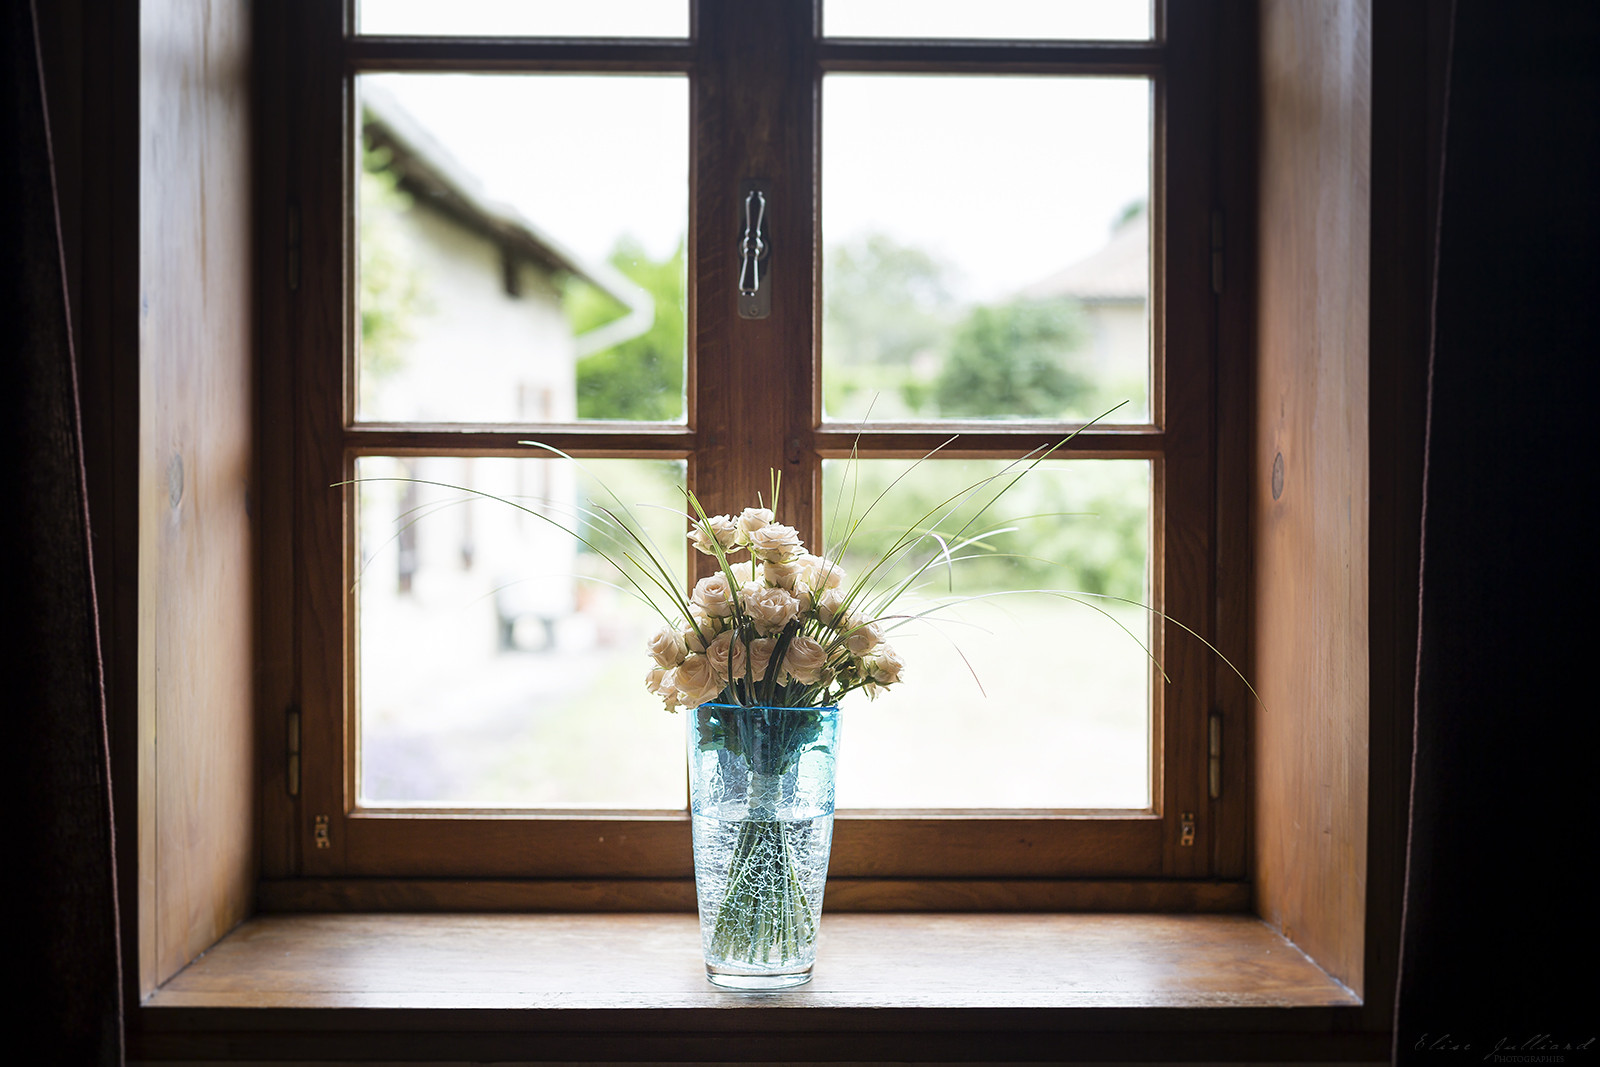 elise-julliard-photographe-mariage-lyon-macon-fleurs-mariee-preparatifs-chateau-de-salornay-rhone-alpes